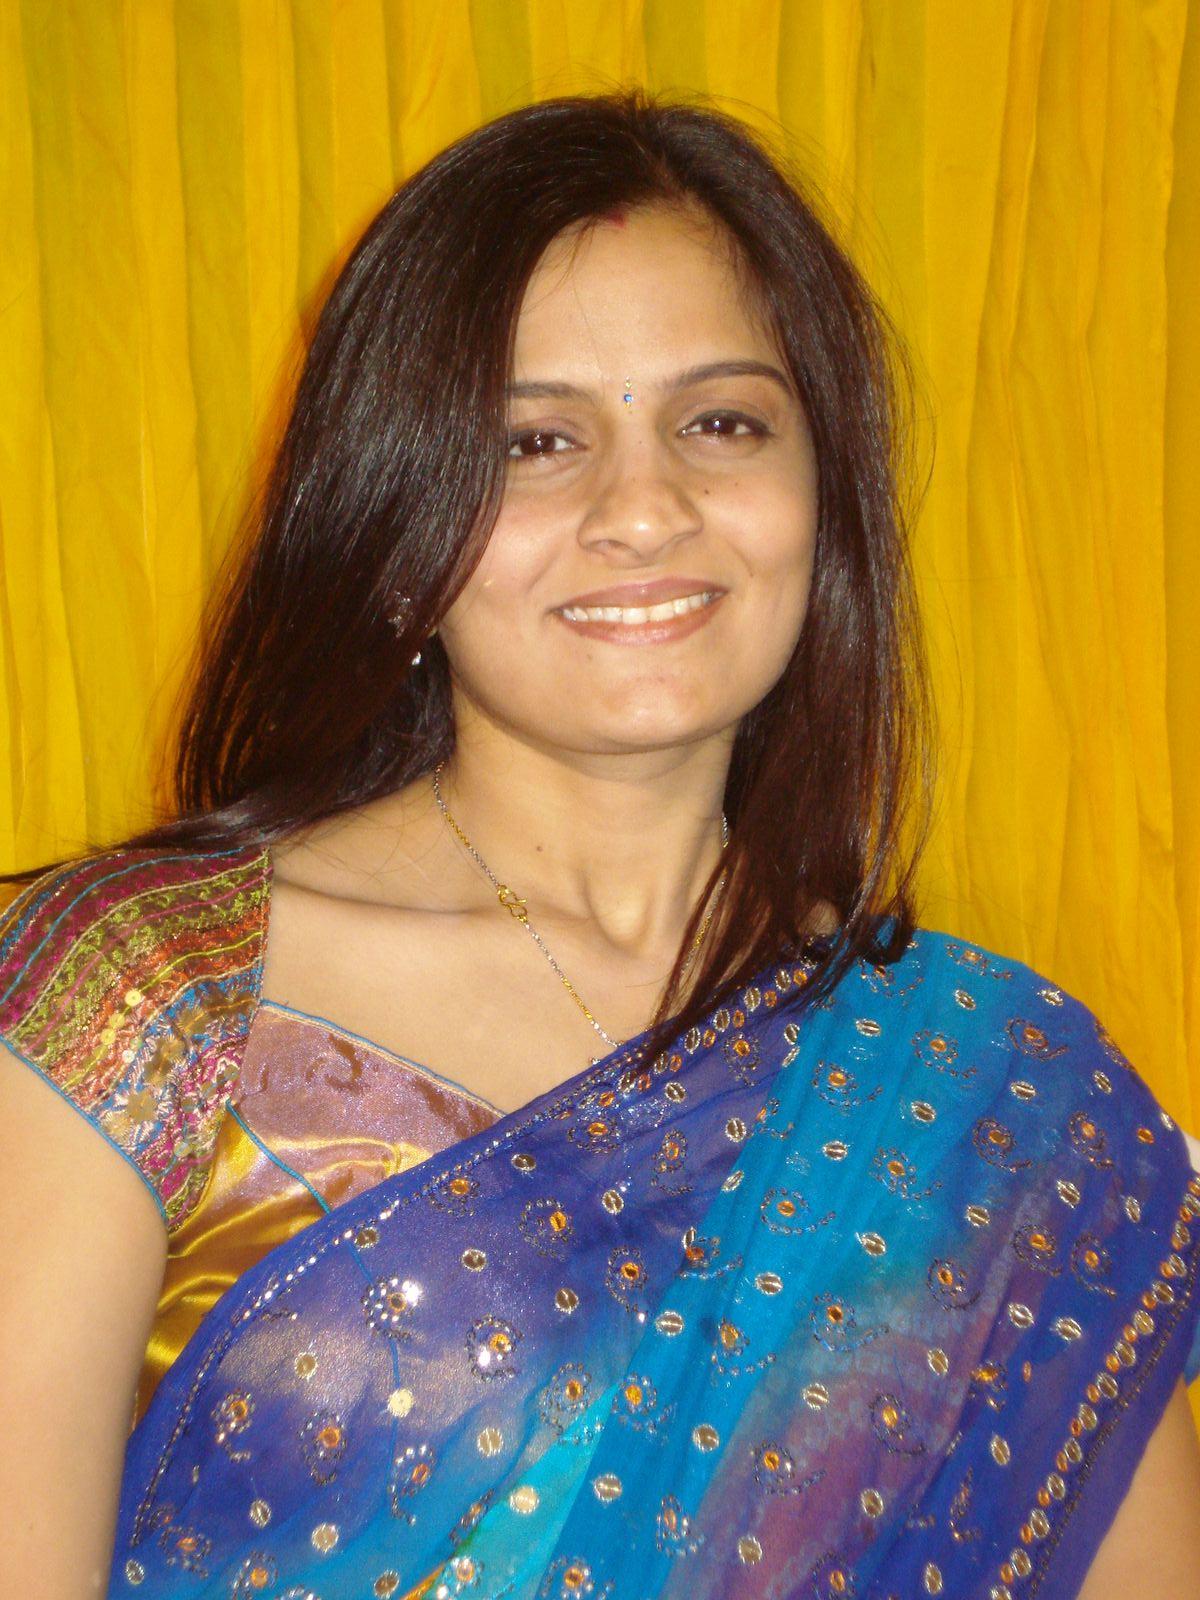 Get indian aunty numbers: Bangalore Women seeking men